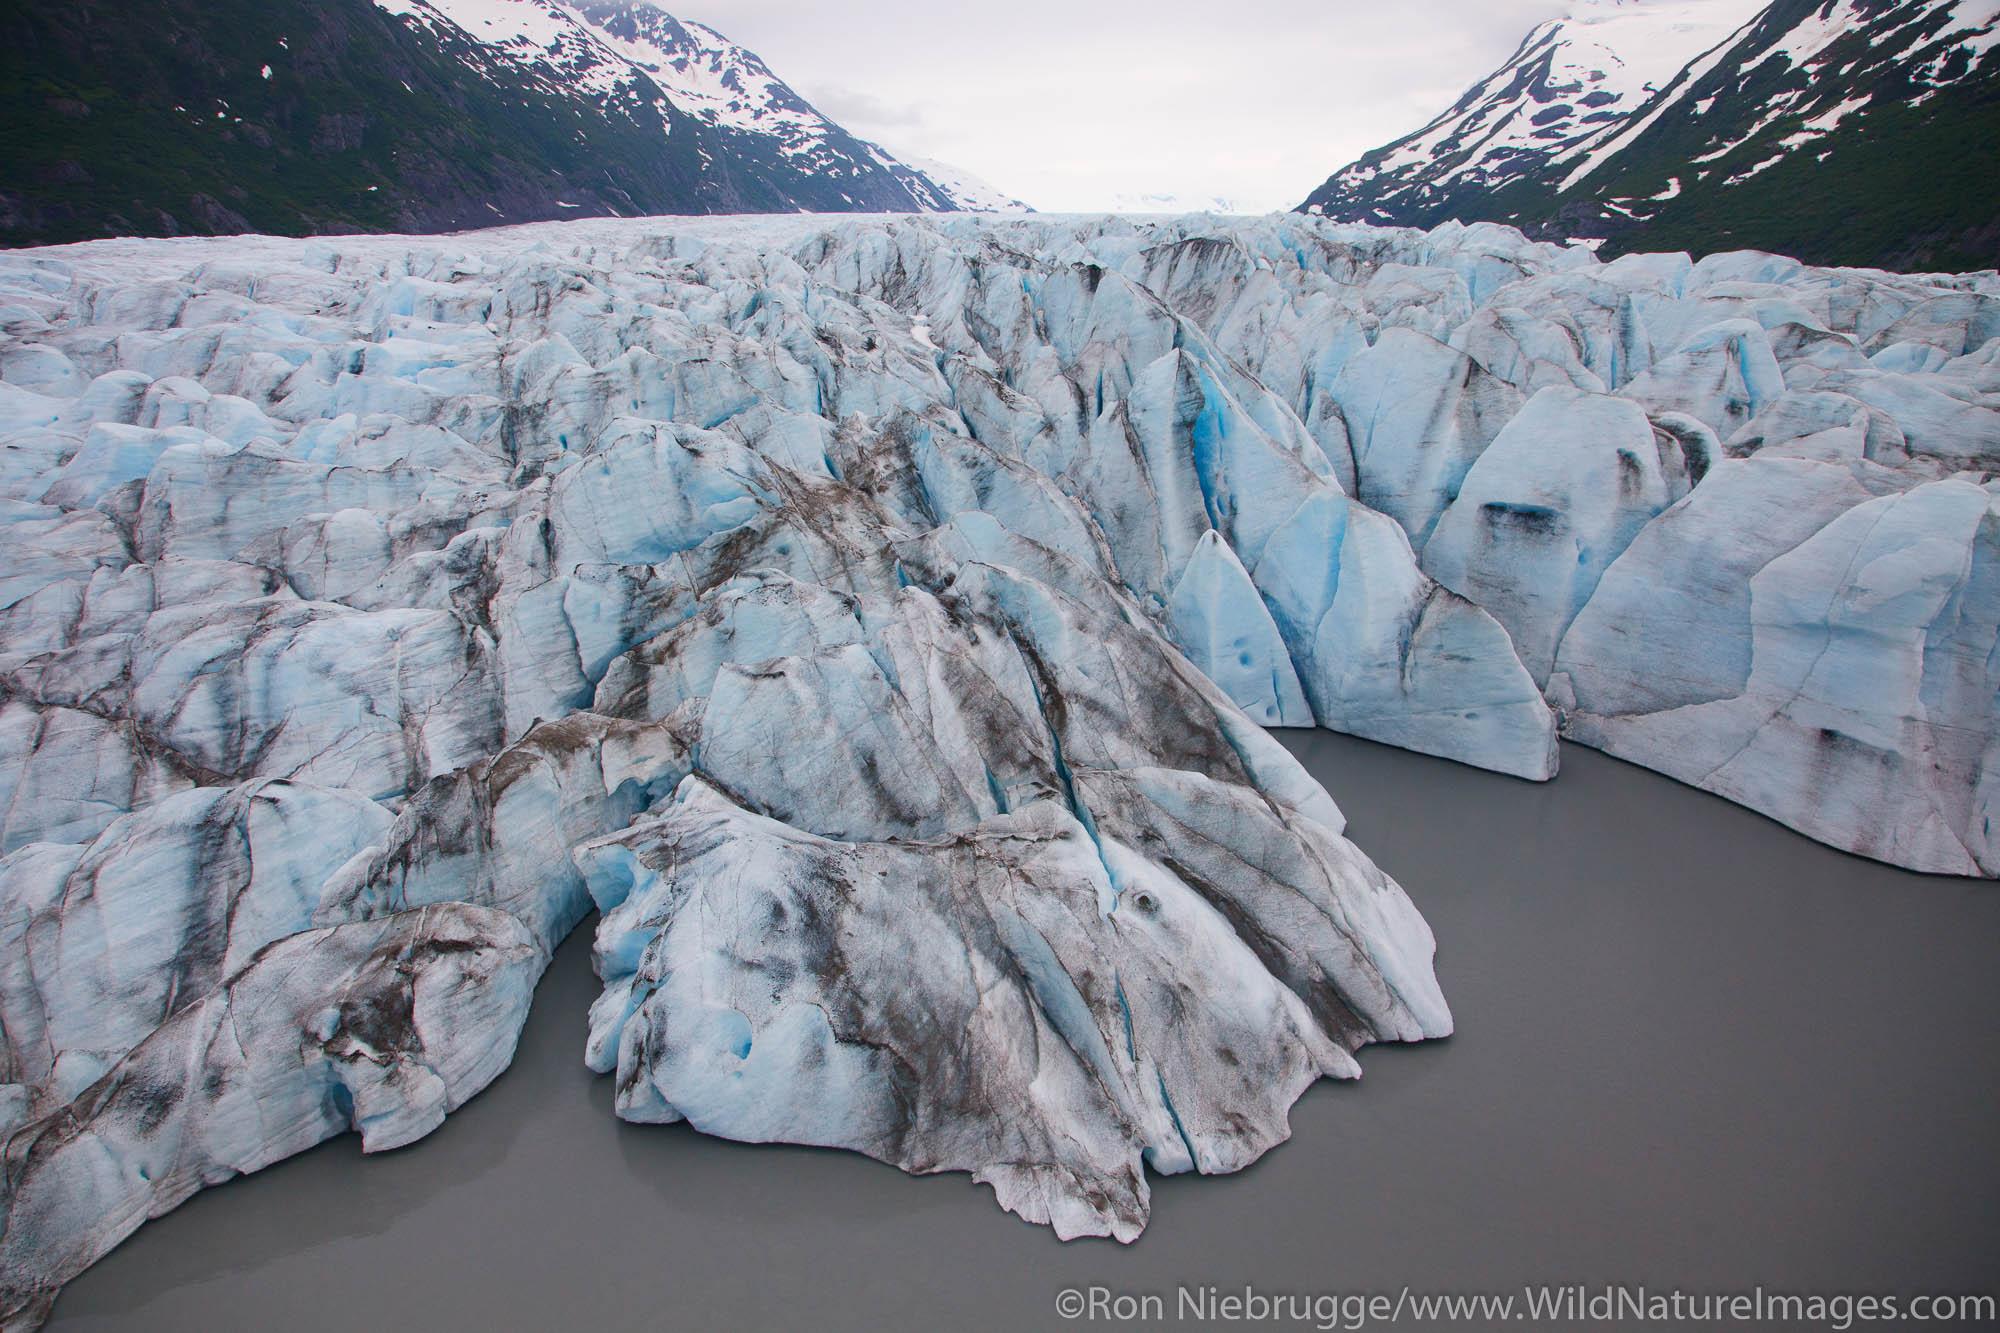 Aerial of Spencer Glacier, Chugach National Forest, Alaska.